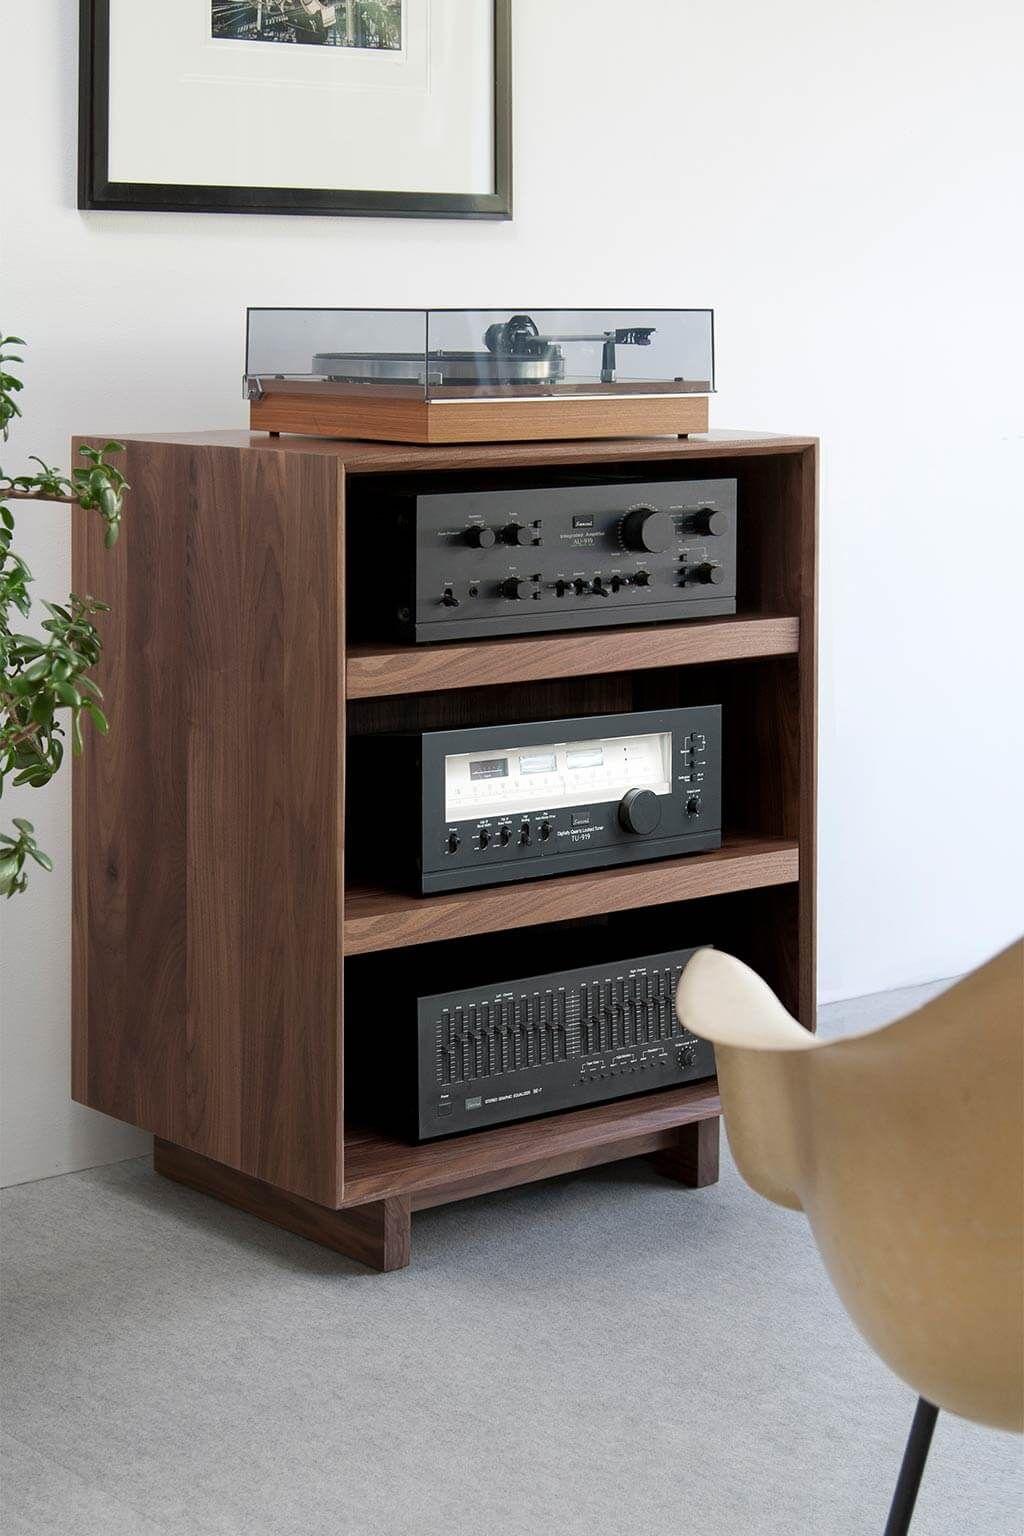 Aero 25 5 Audio Rack Mit Bildern Hifi Mobel Tv Wand